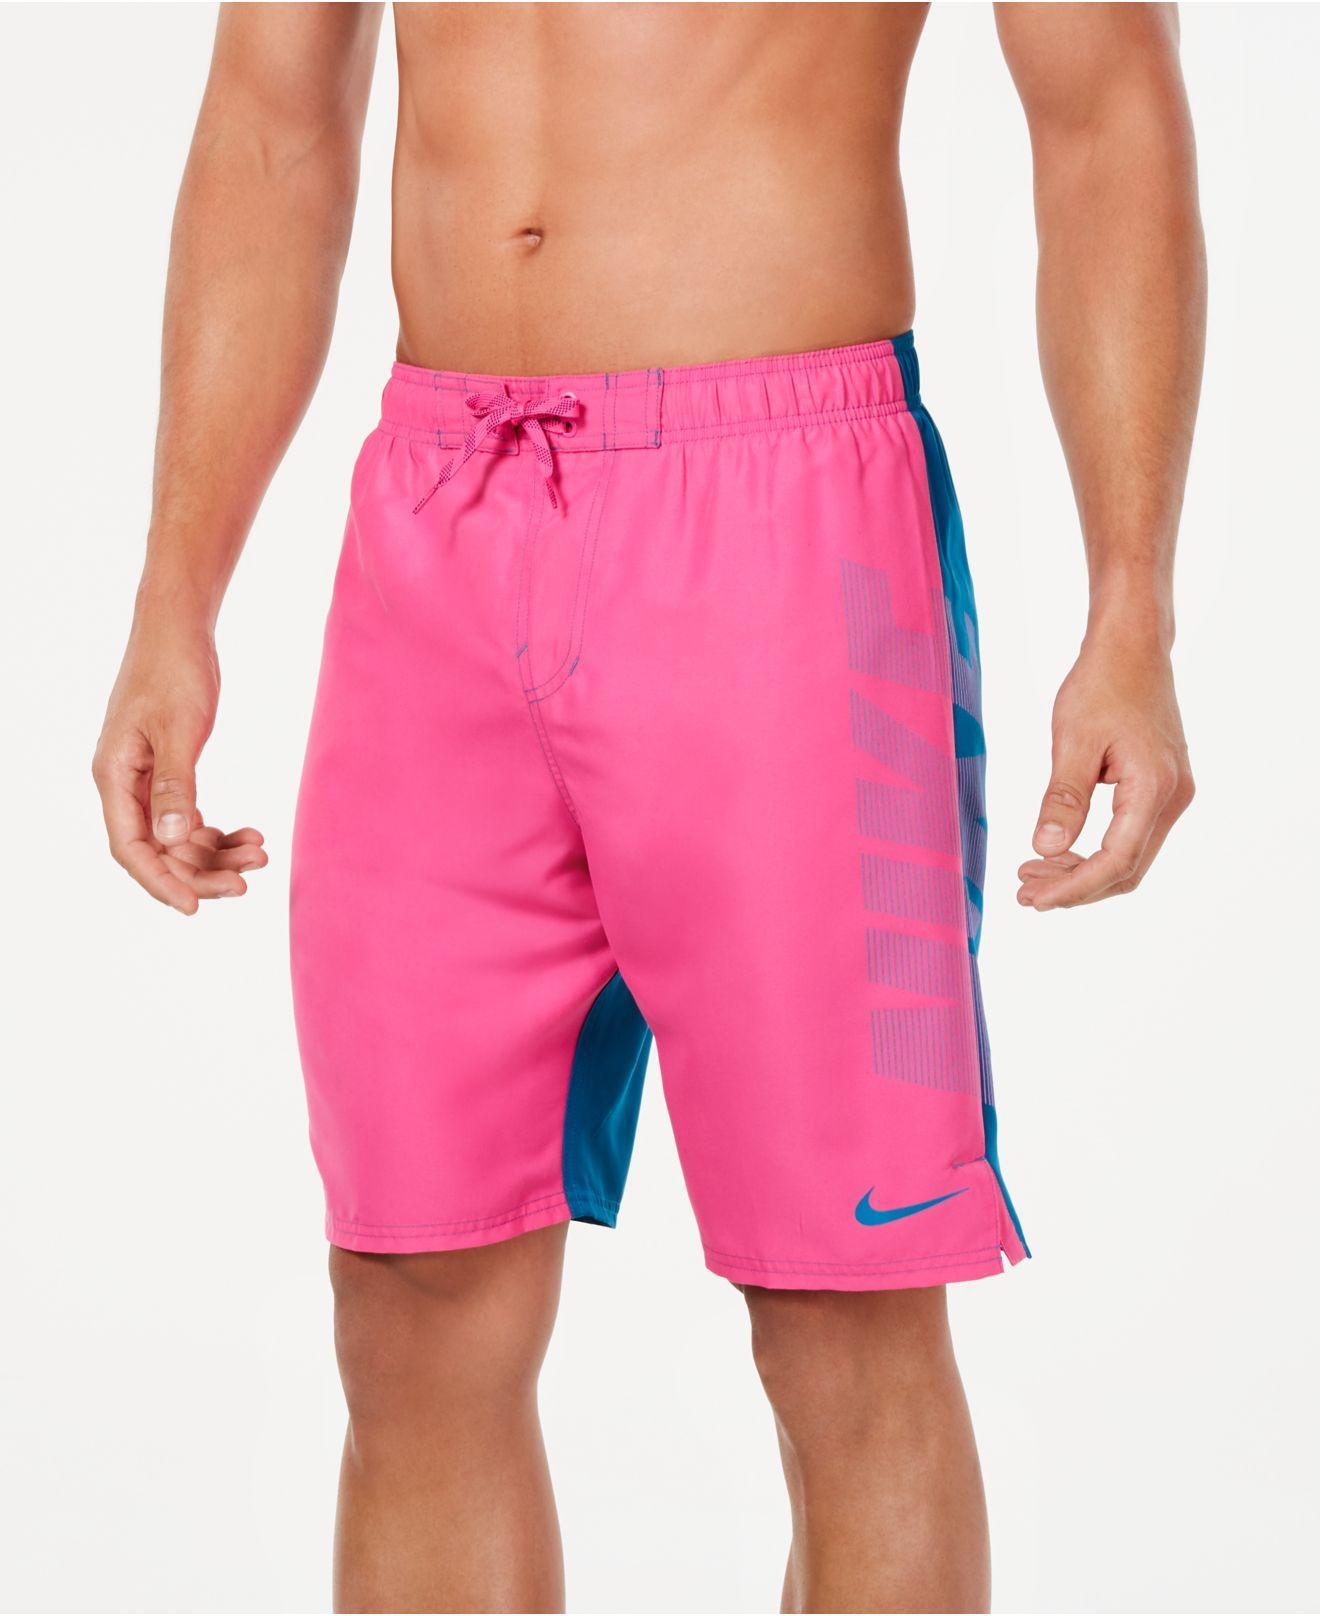 467ca84465 Nike - Multicolor Rift Vital Regular-fit Quick-dry 9